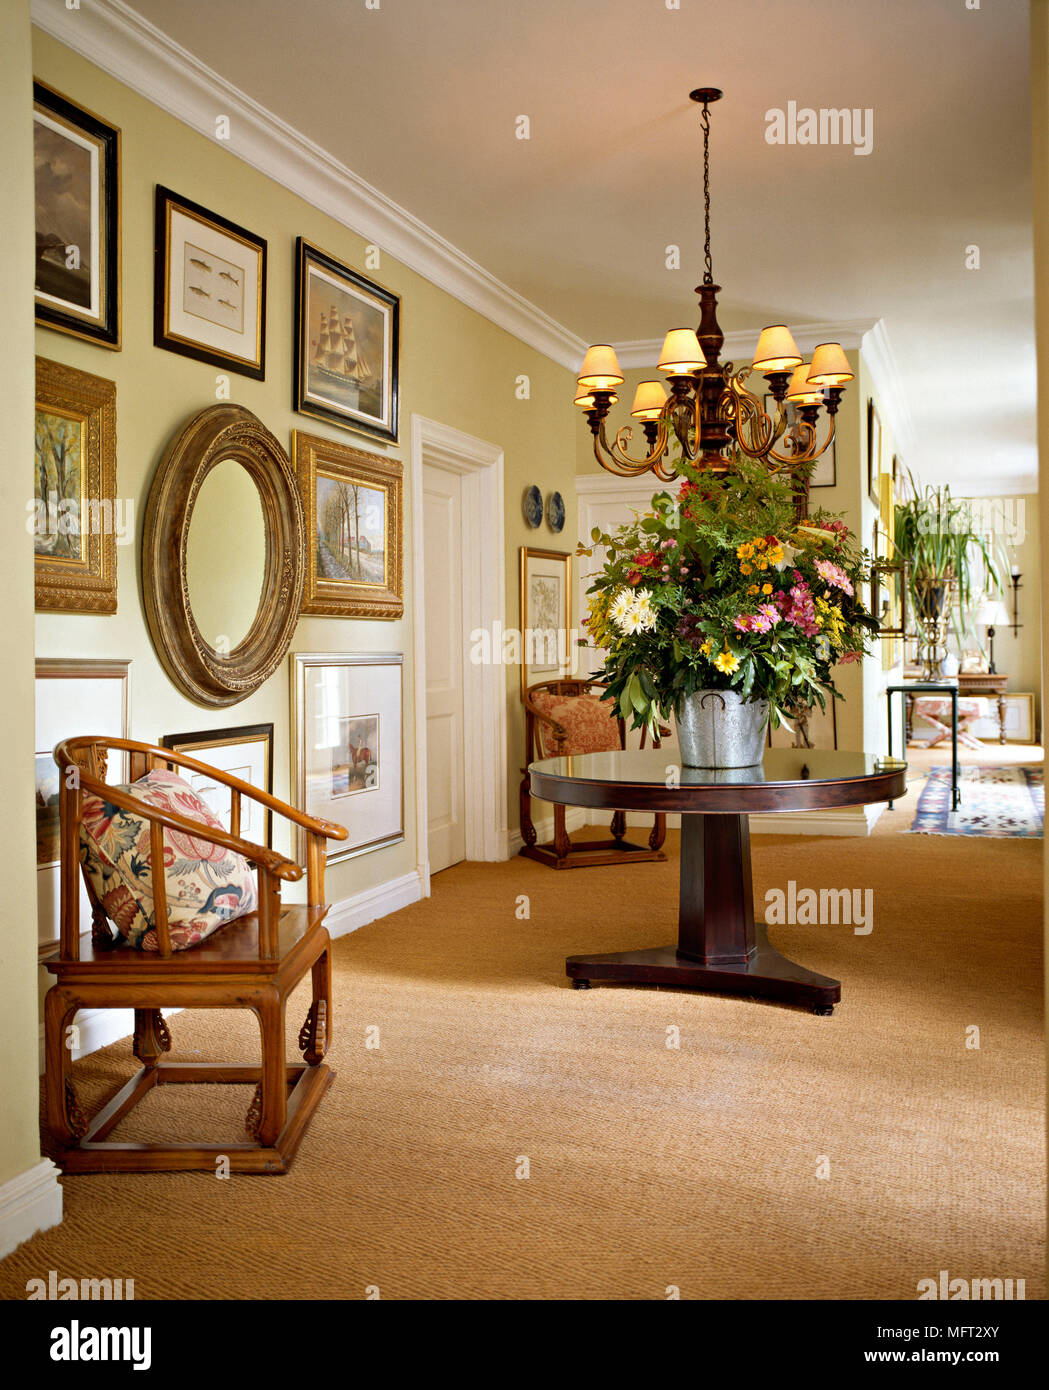 Traditional Yellow Hallway Carpet Pedestal Table Flower Arrangement Wood  Chair Chandelier Interiors Halls Hallways Period Furniture Features Spacious